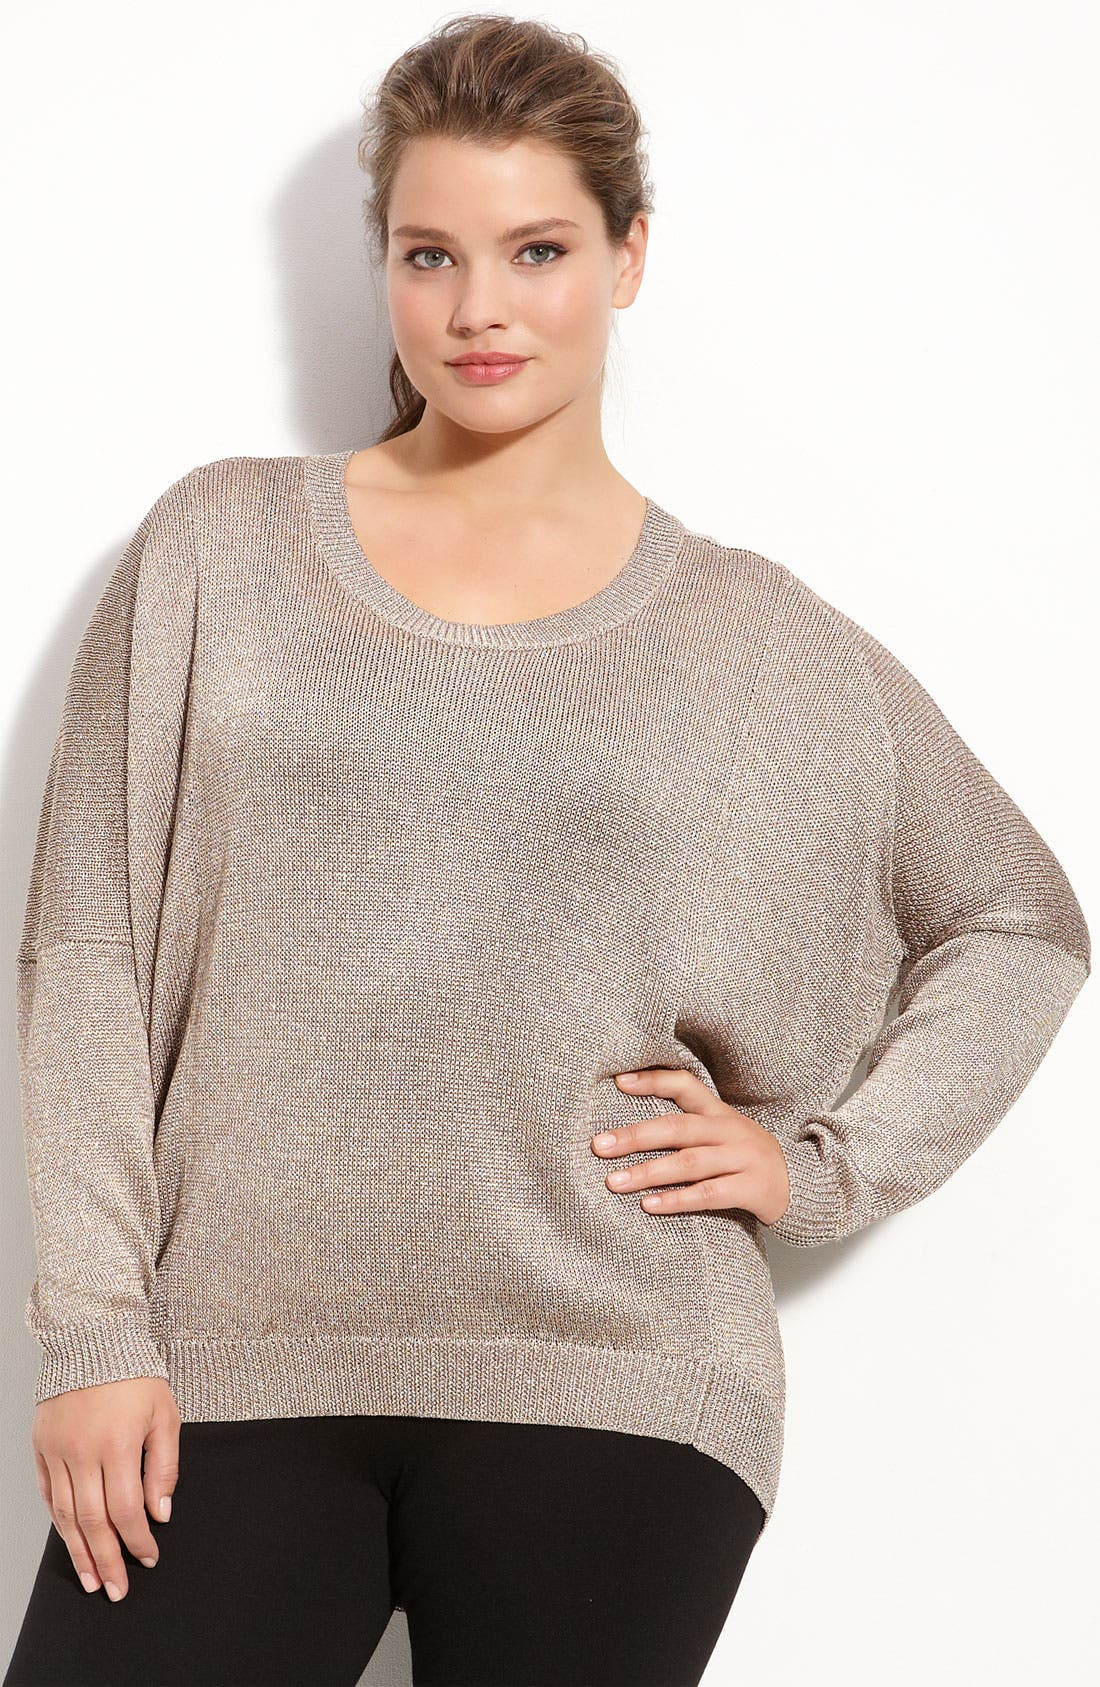 Alternate Image 1 Selected - Vince Camuto Dolman Sleeve Back Zip Sweater (Plus)